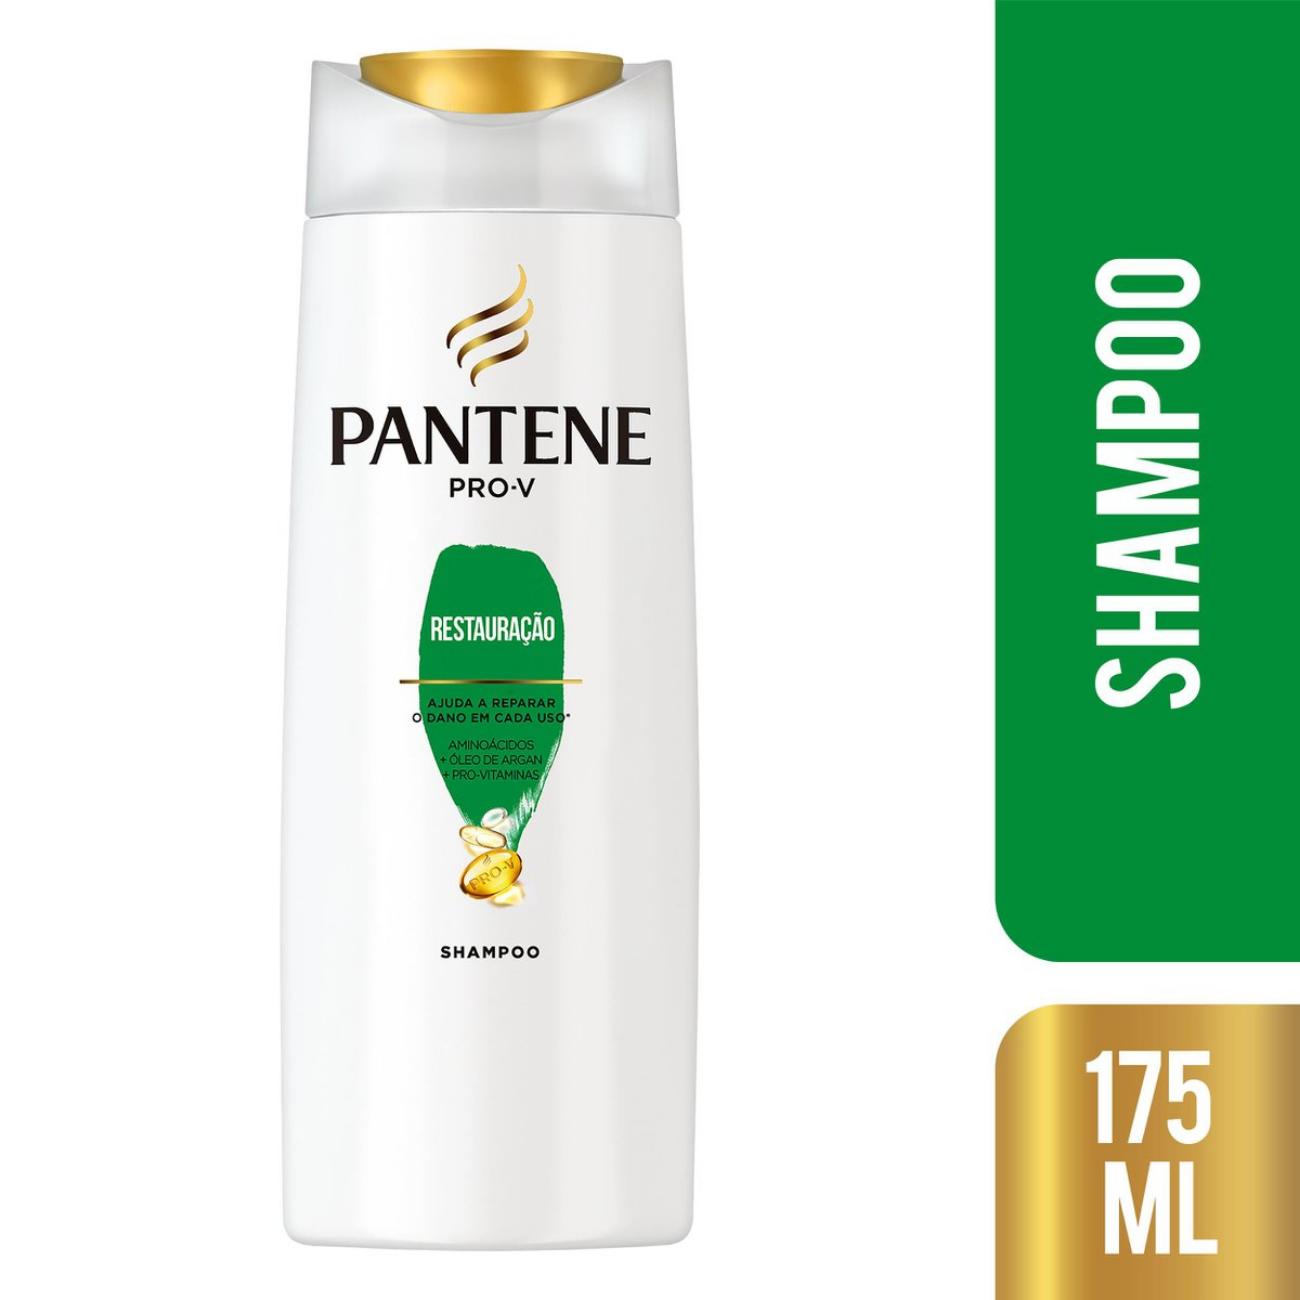 Shampoo Pantene Restauracao 175ml